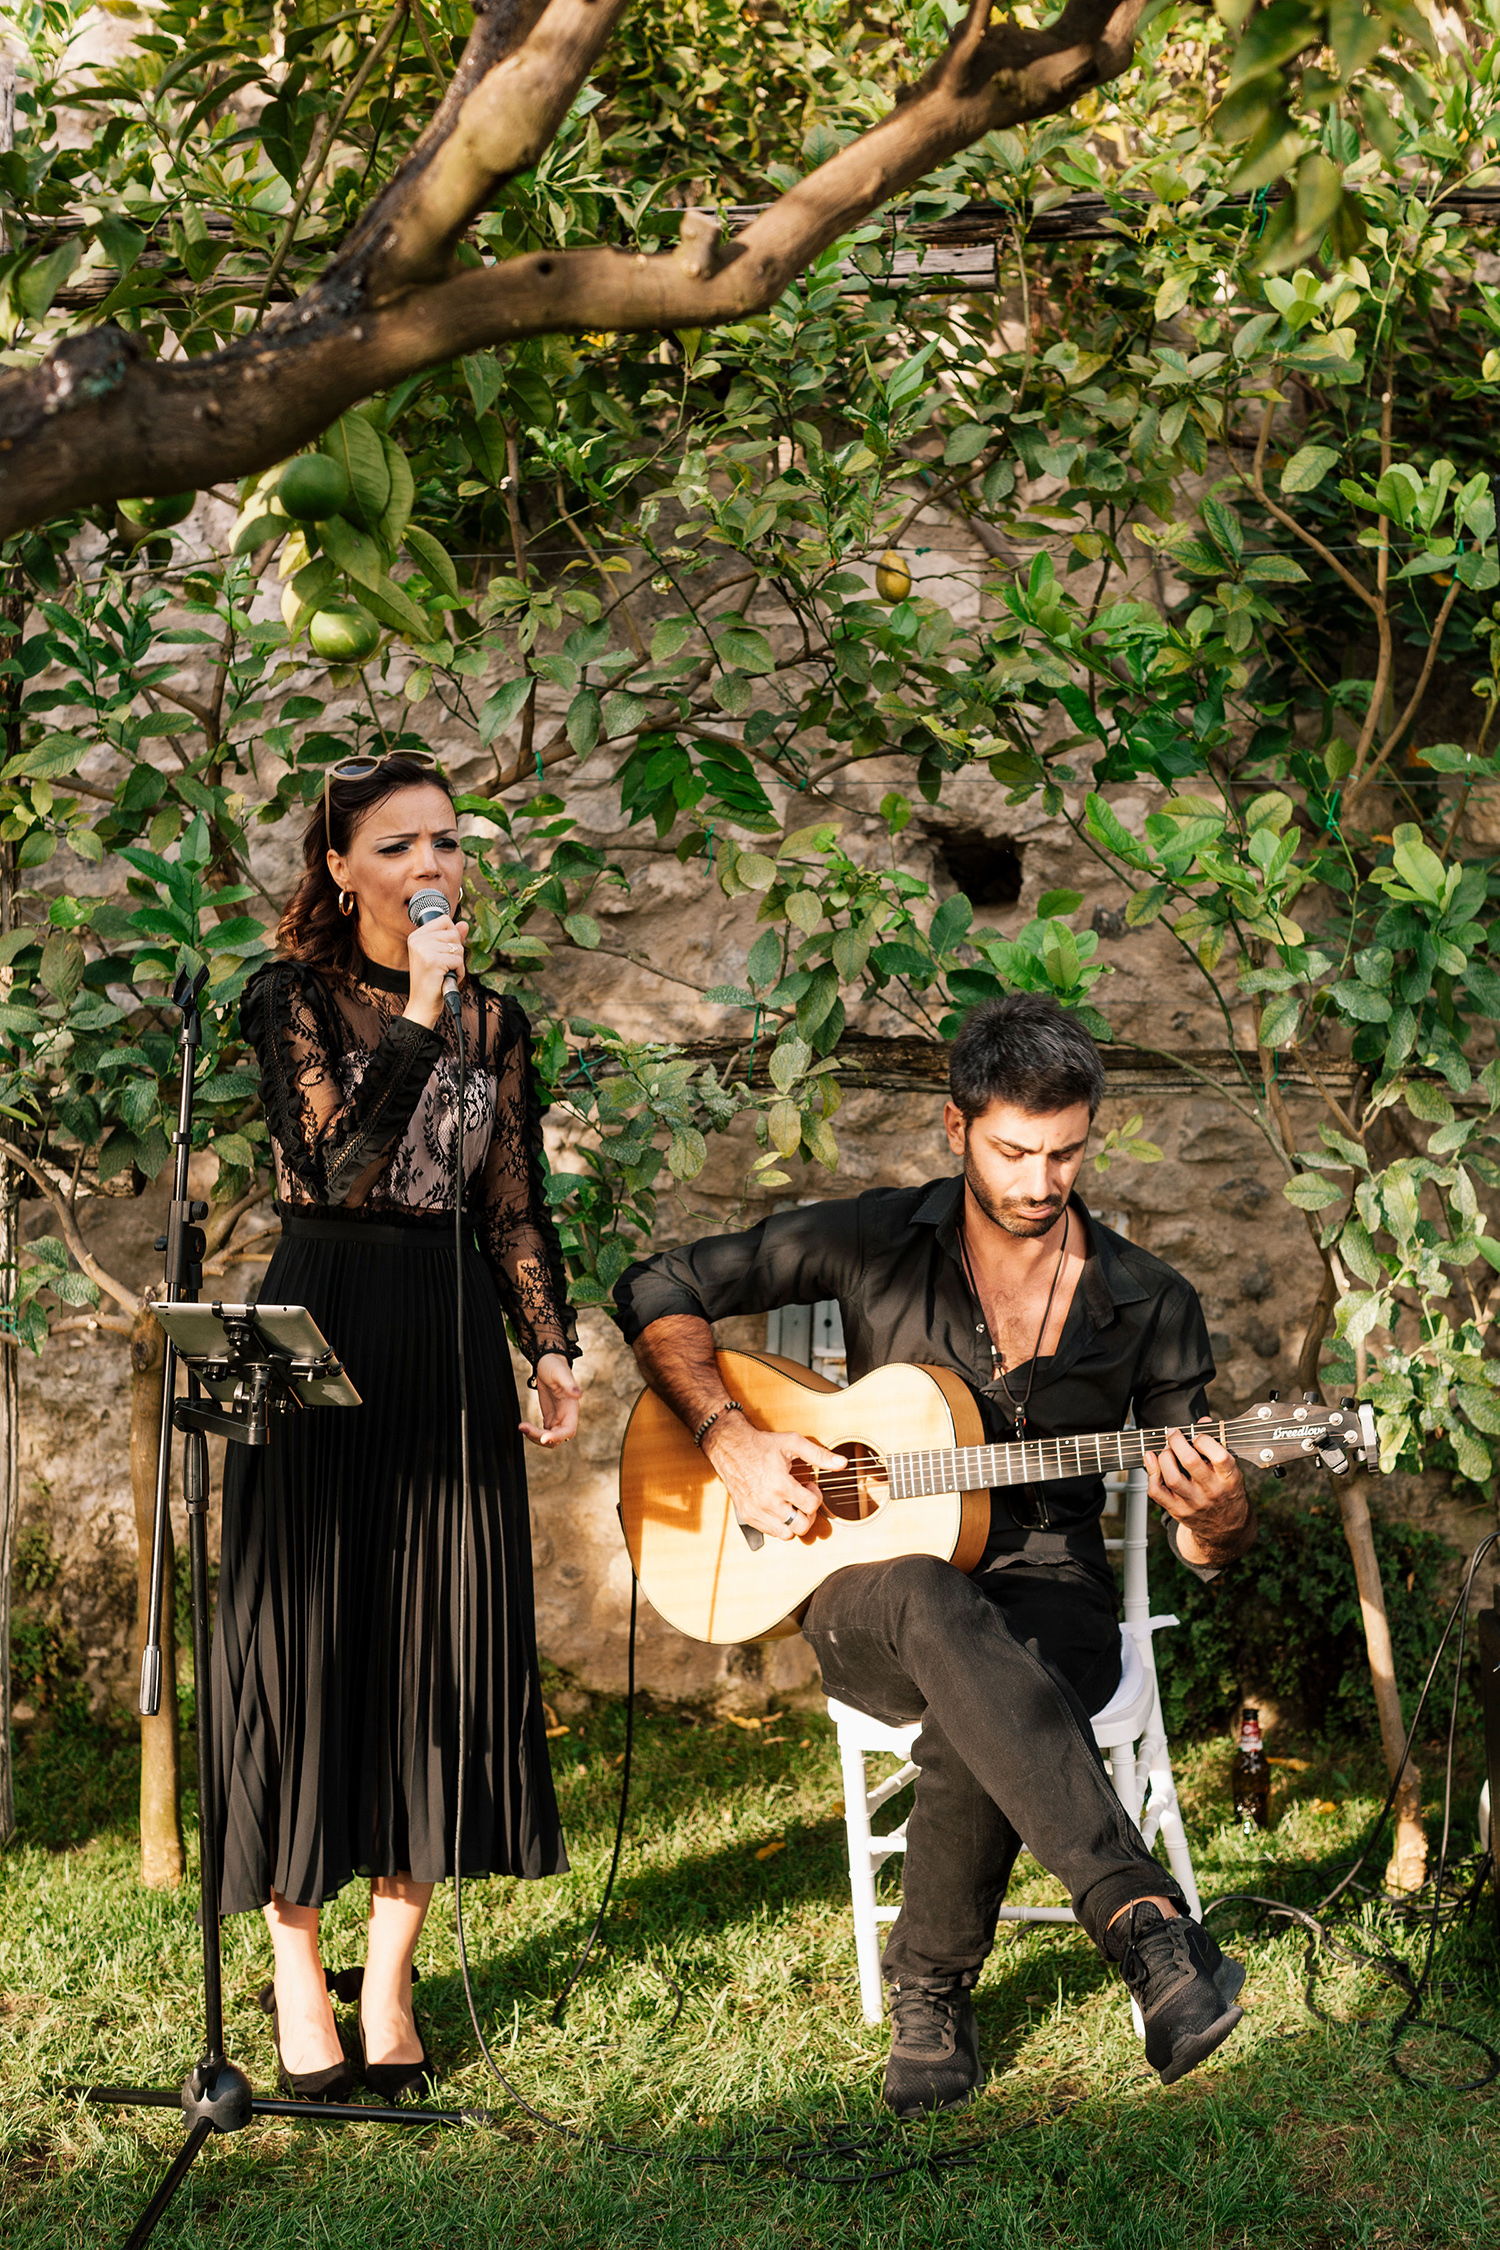 cara david wedding musicians